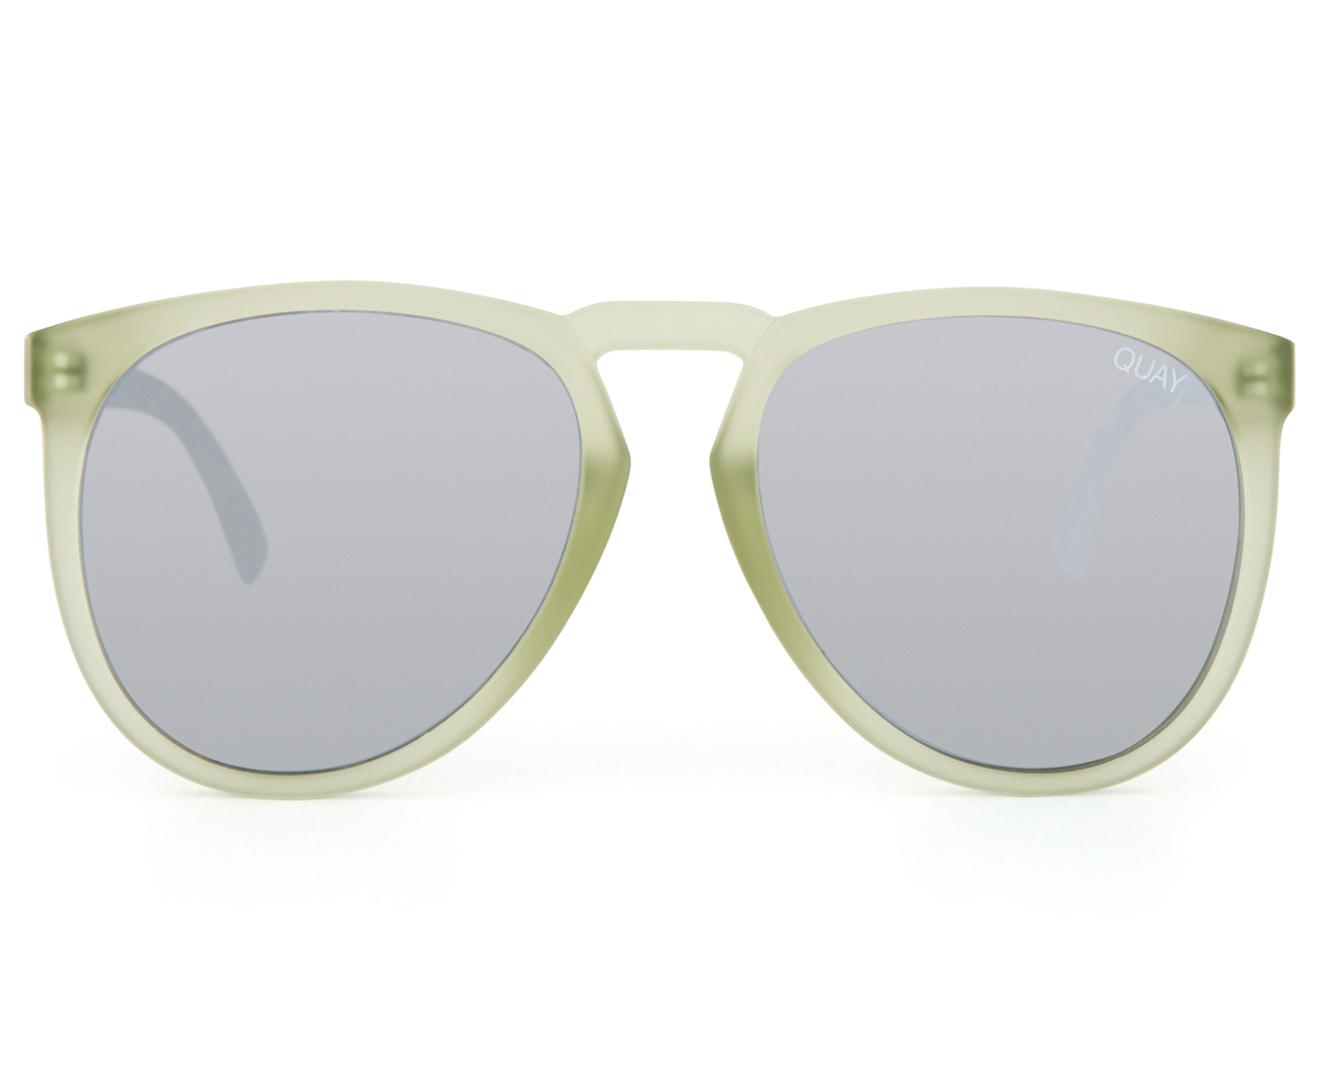 ae9064ef1d Quay Australia Women s PHD Sunglasses - Olive Silver